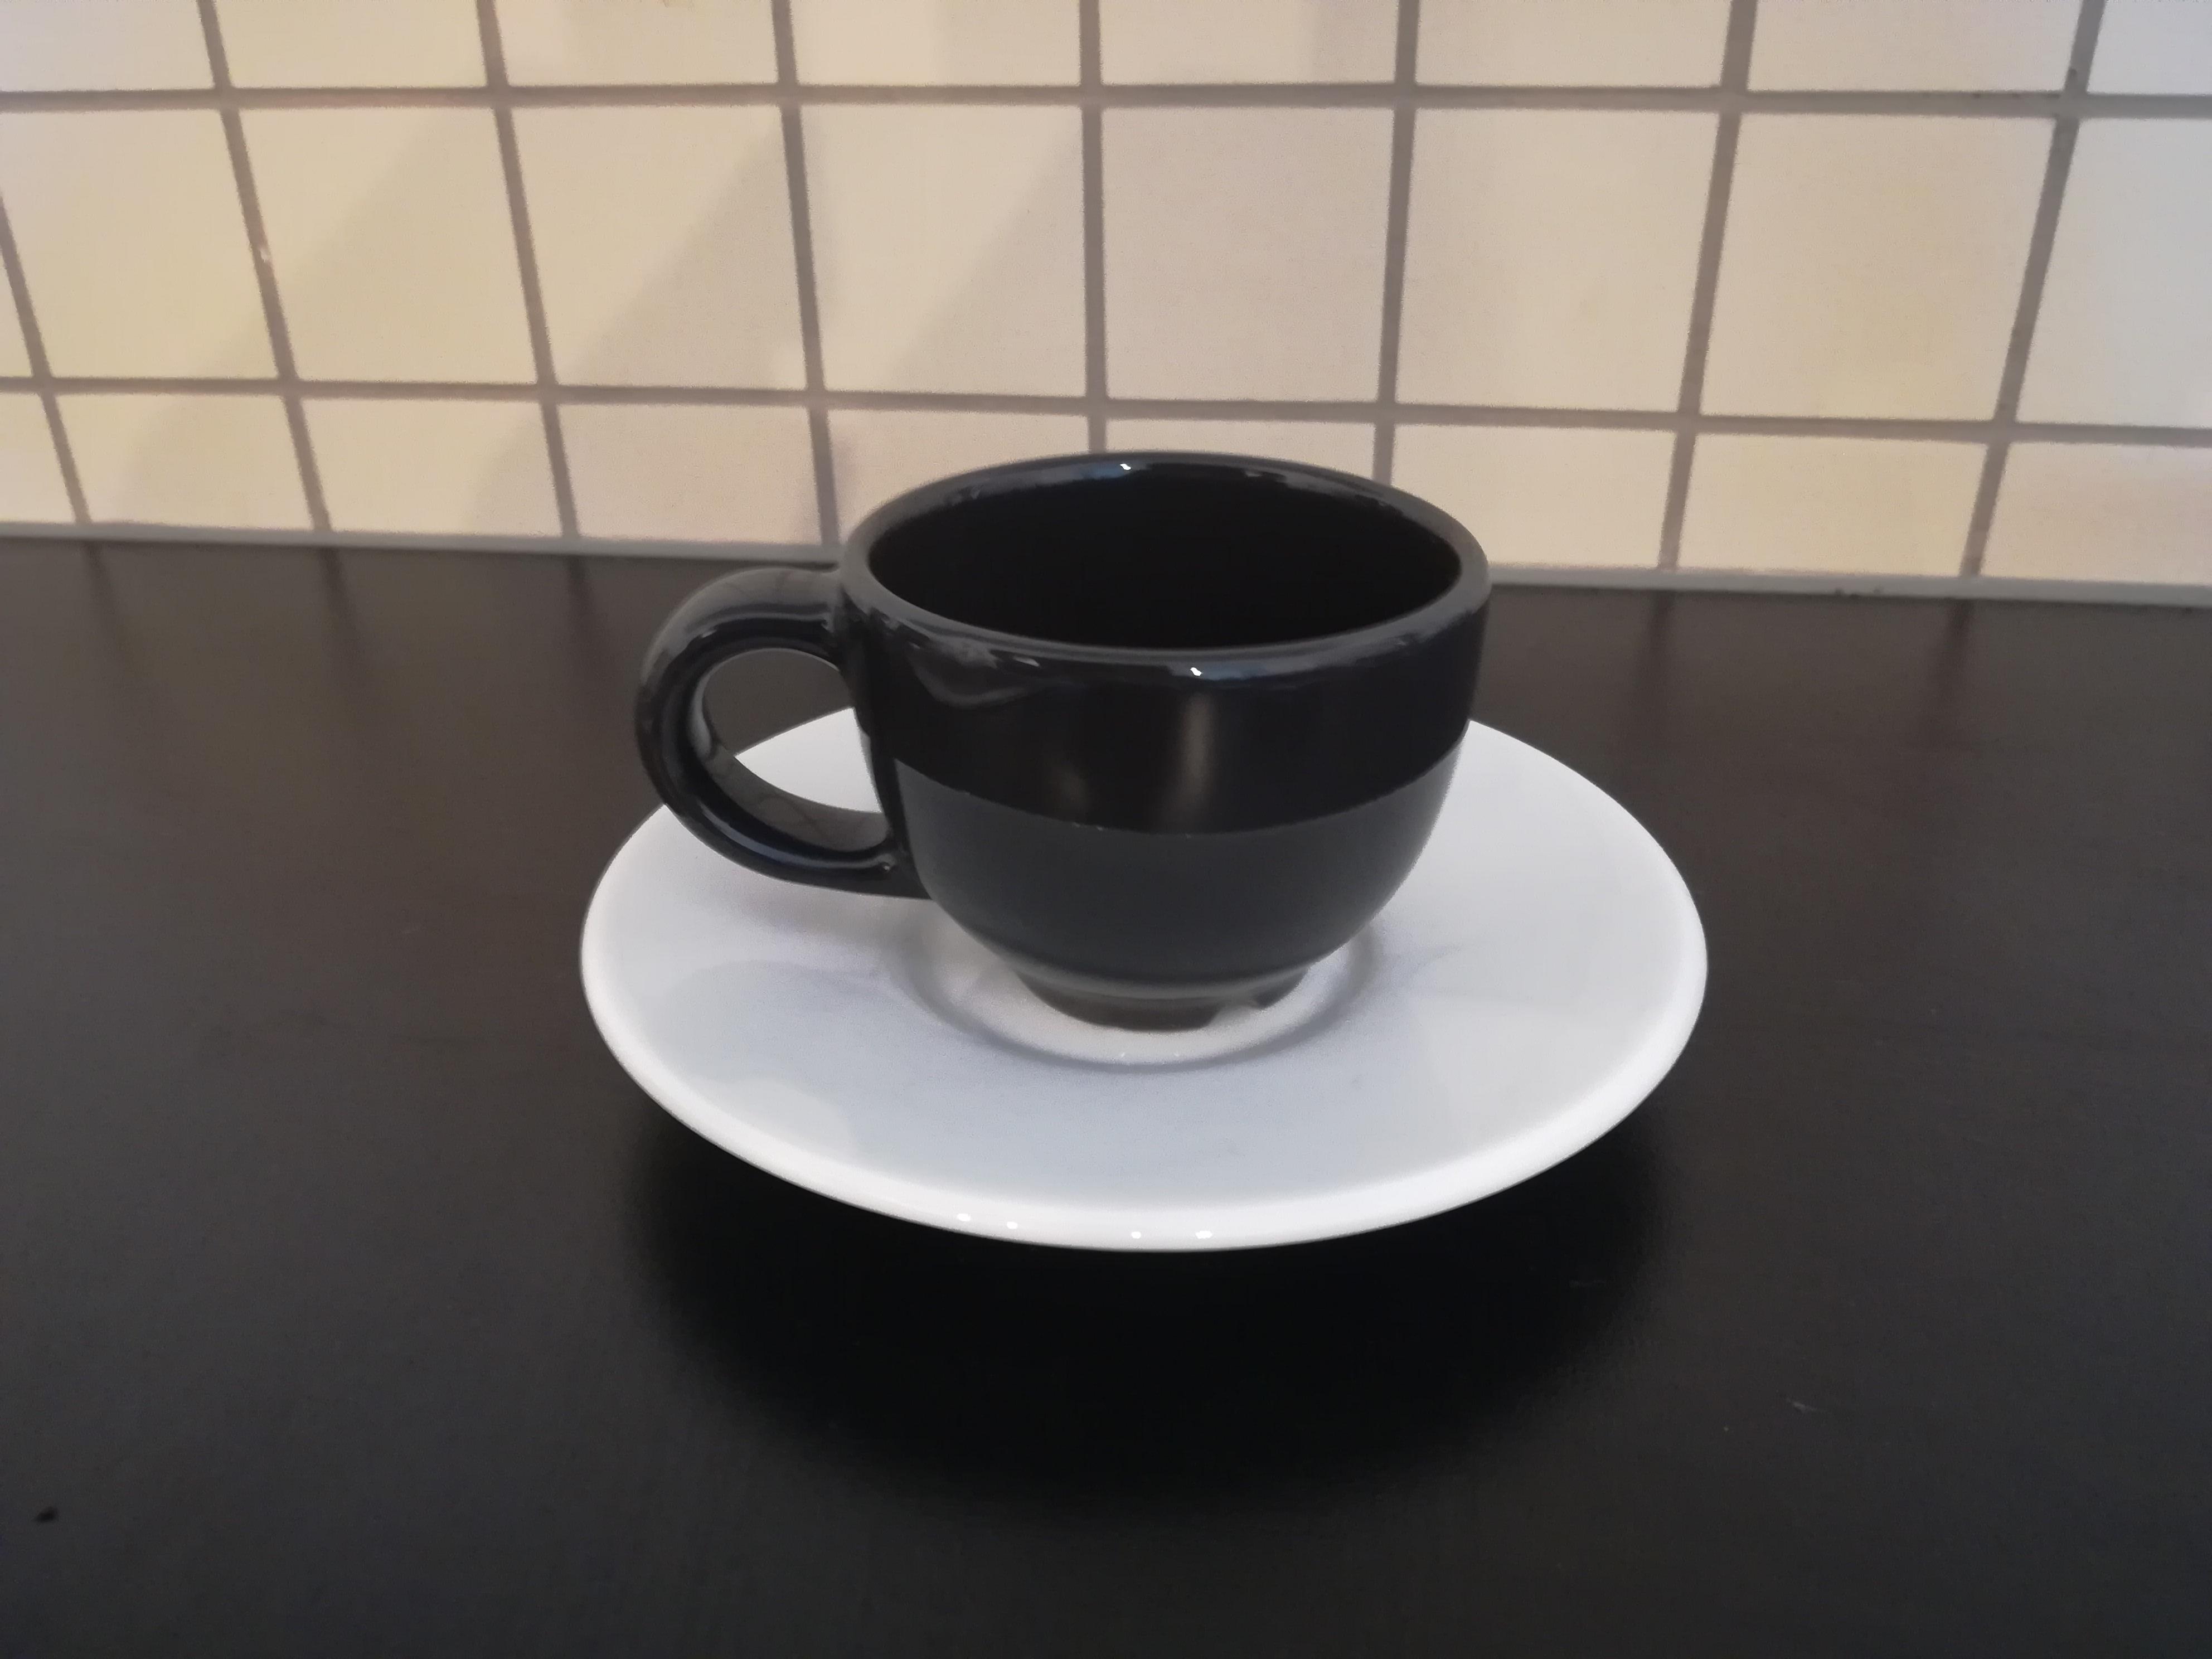 Na kávičku